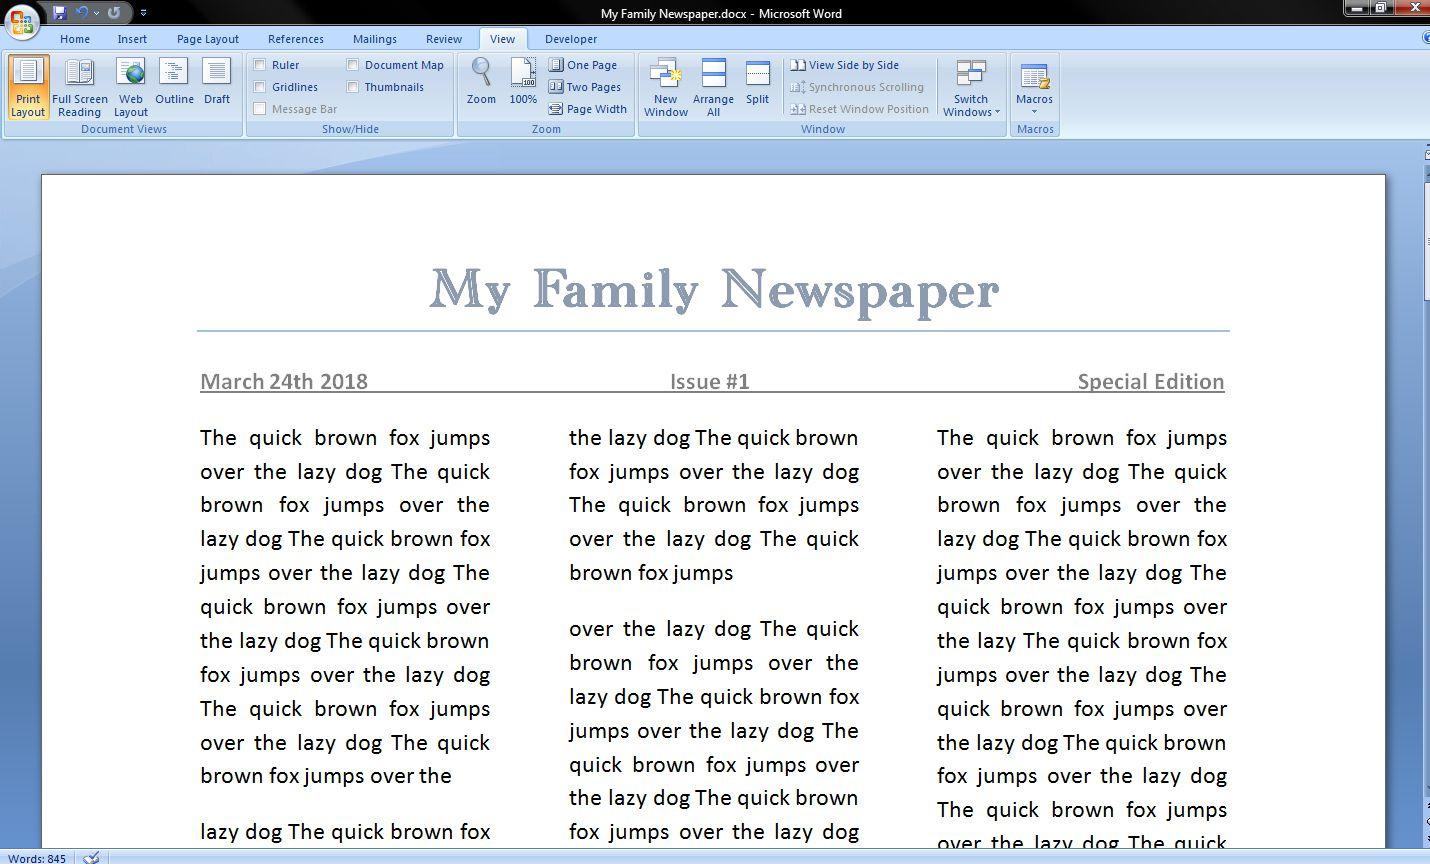 006 Best Microsoft Word Newspaper Template Example  Vintage Old FashionedFull